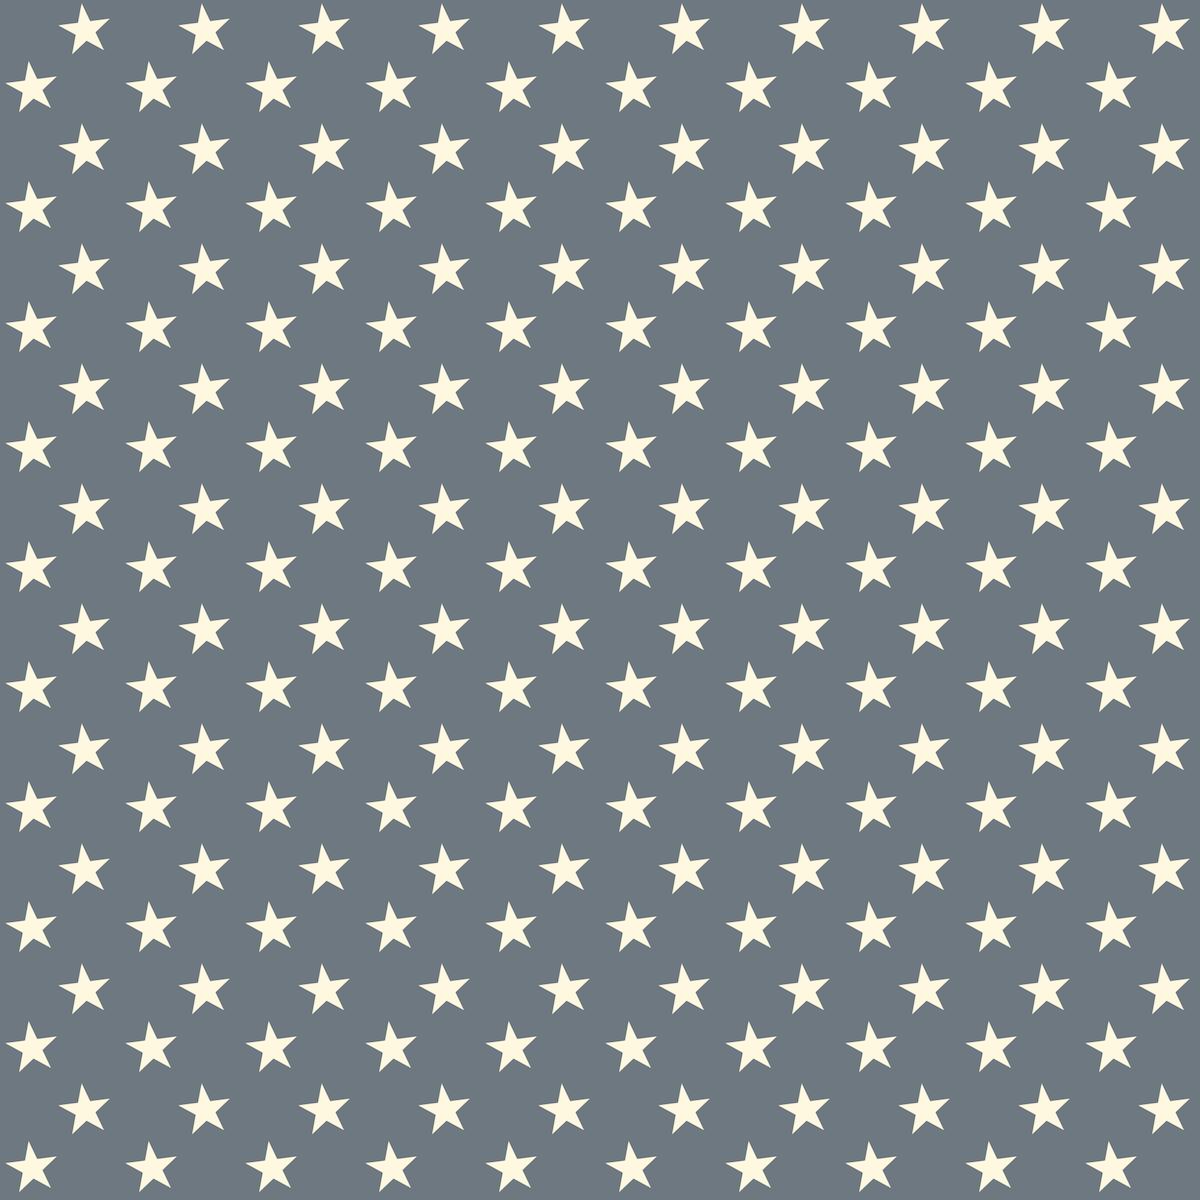 Free digital stars and polka dot scrapbooking papers - ausdruckbares ...